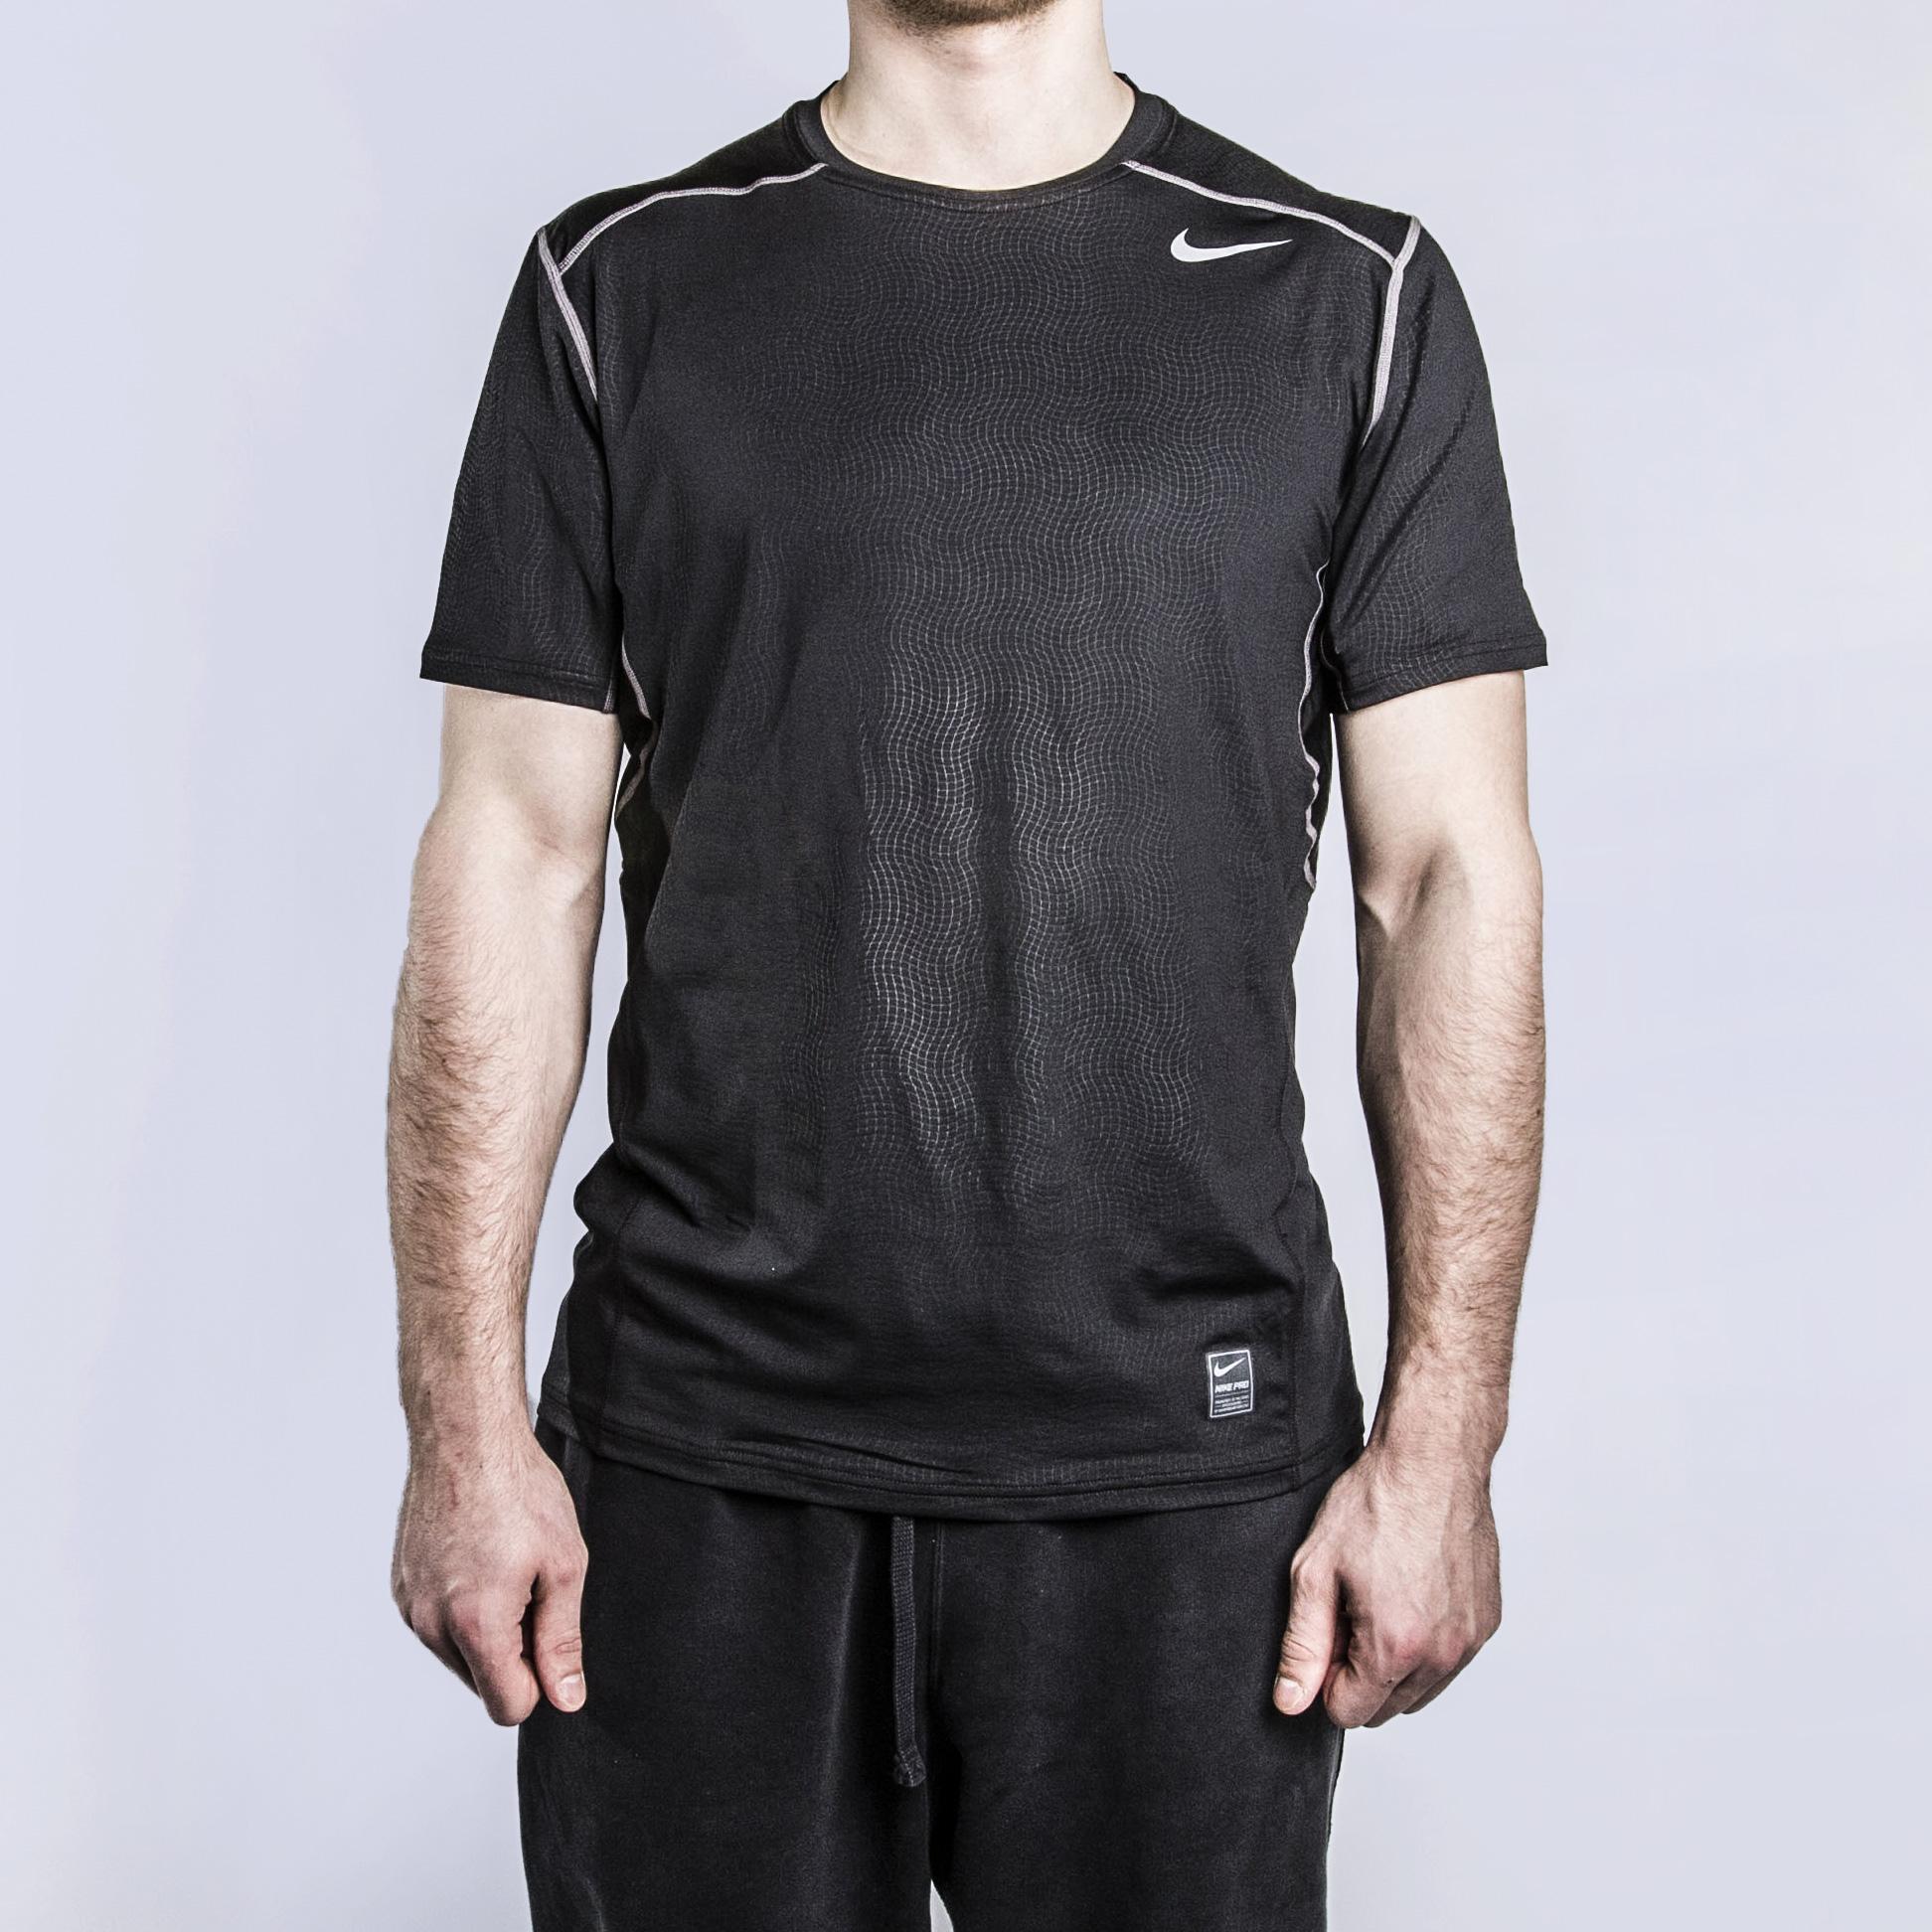 Футболка для тренинга Nike Hypercool FTTD SS TopФутболки<br>92% полиэстер, 8% эластан<br><br>Цвет: Черный<br>Размеры US: XL<br>Пол: Мужской